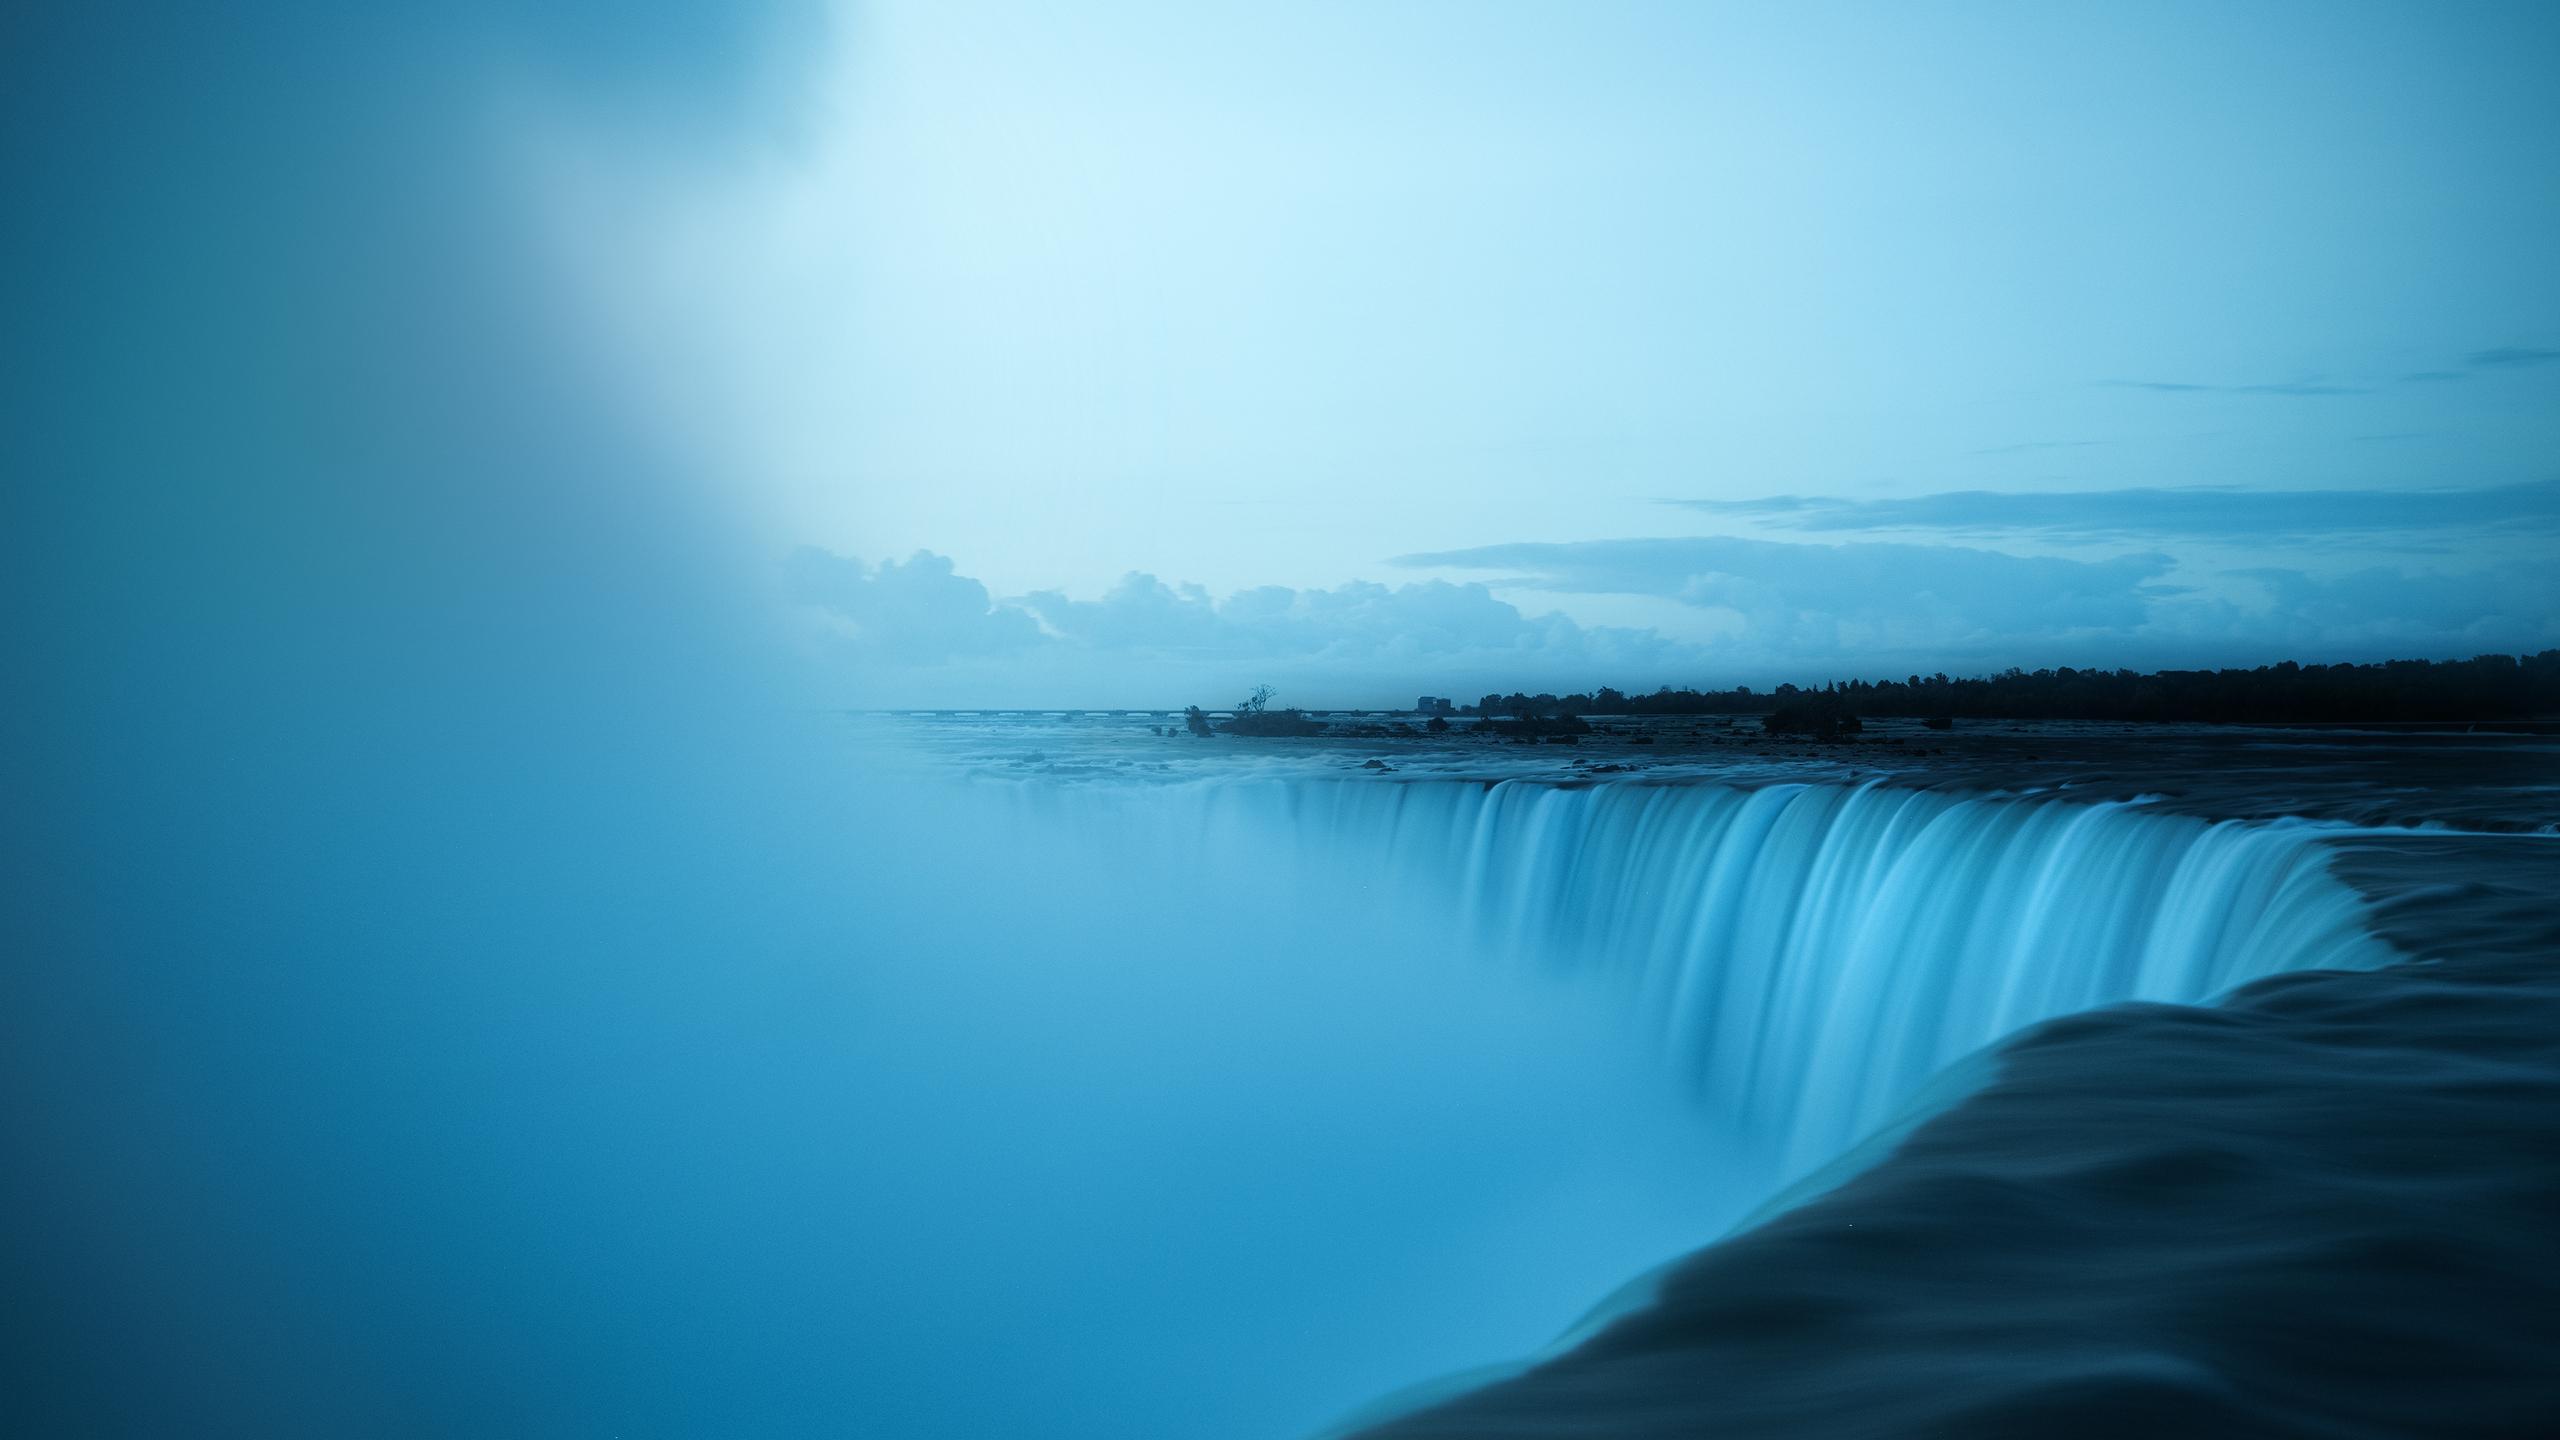 2560x1440 Niagara Falls 4k 1440p Resolution Hd 4k Wallpapers